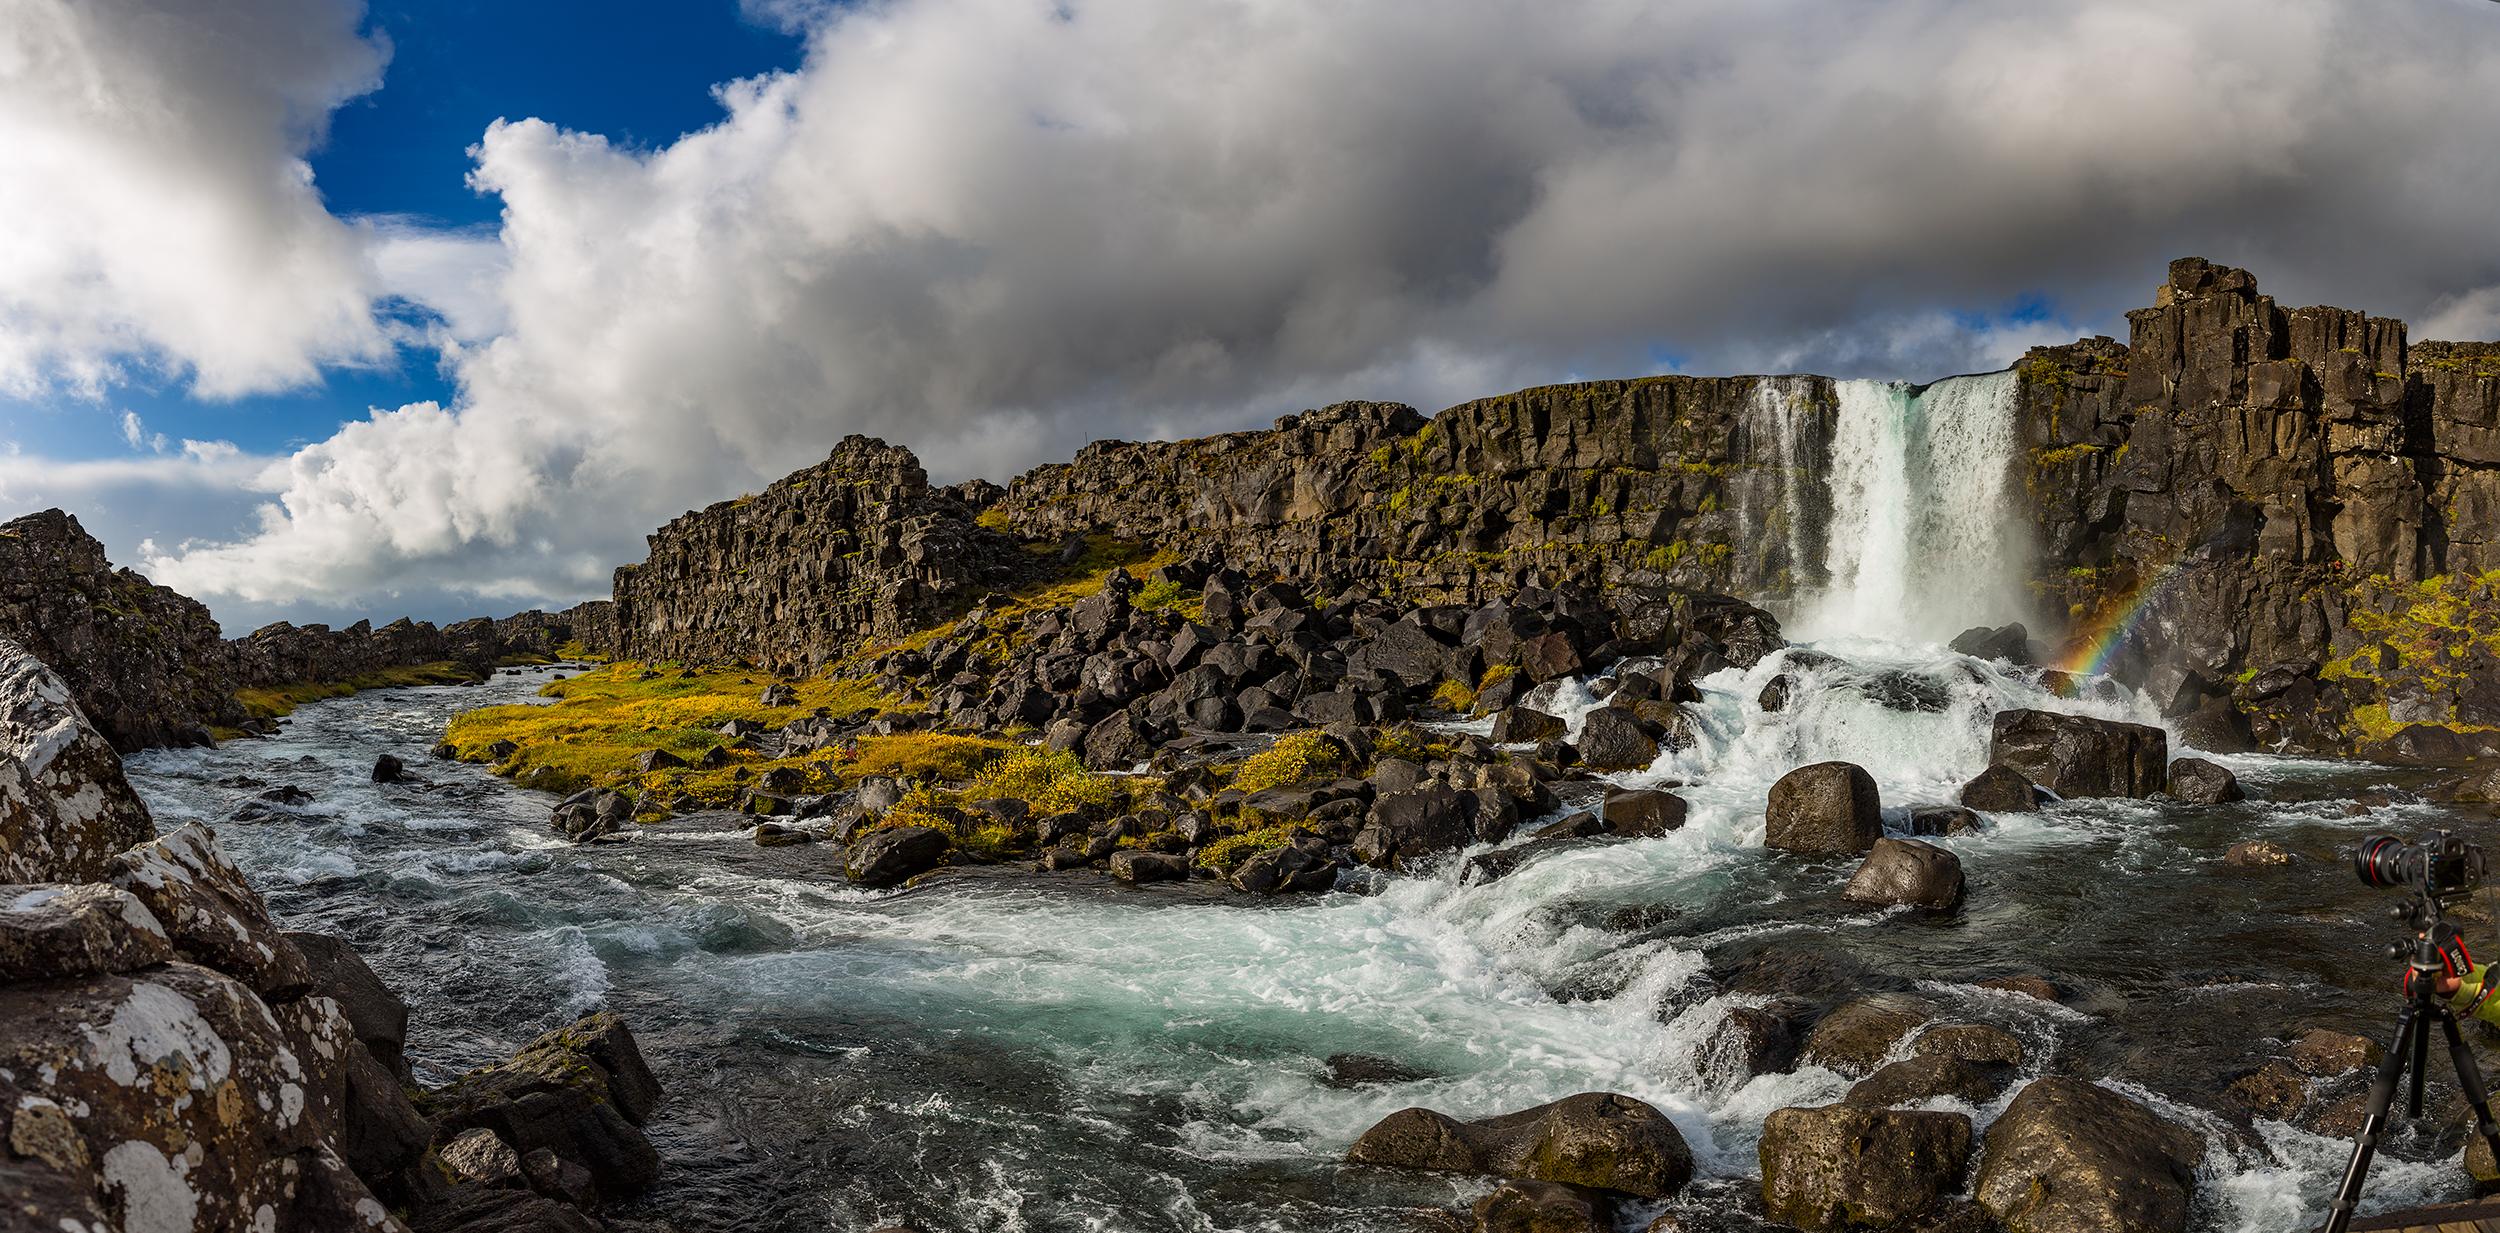 Öxarárfoss in Þingvellir tumbles down lava rocks on the Golden Circle in Iceland.